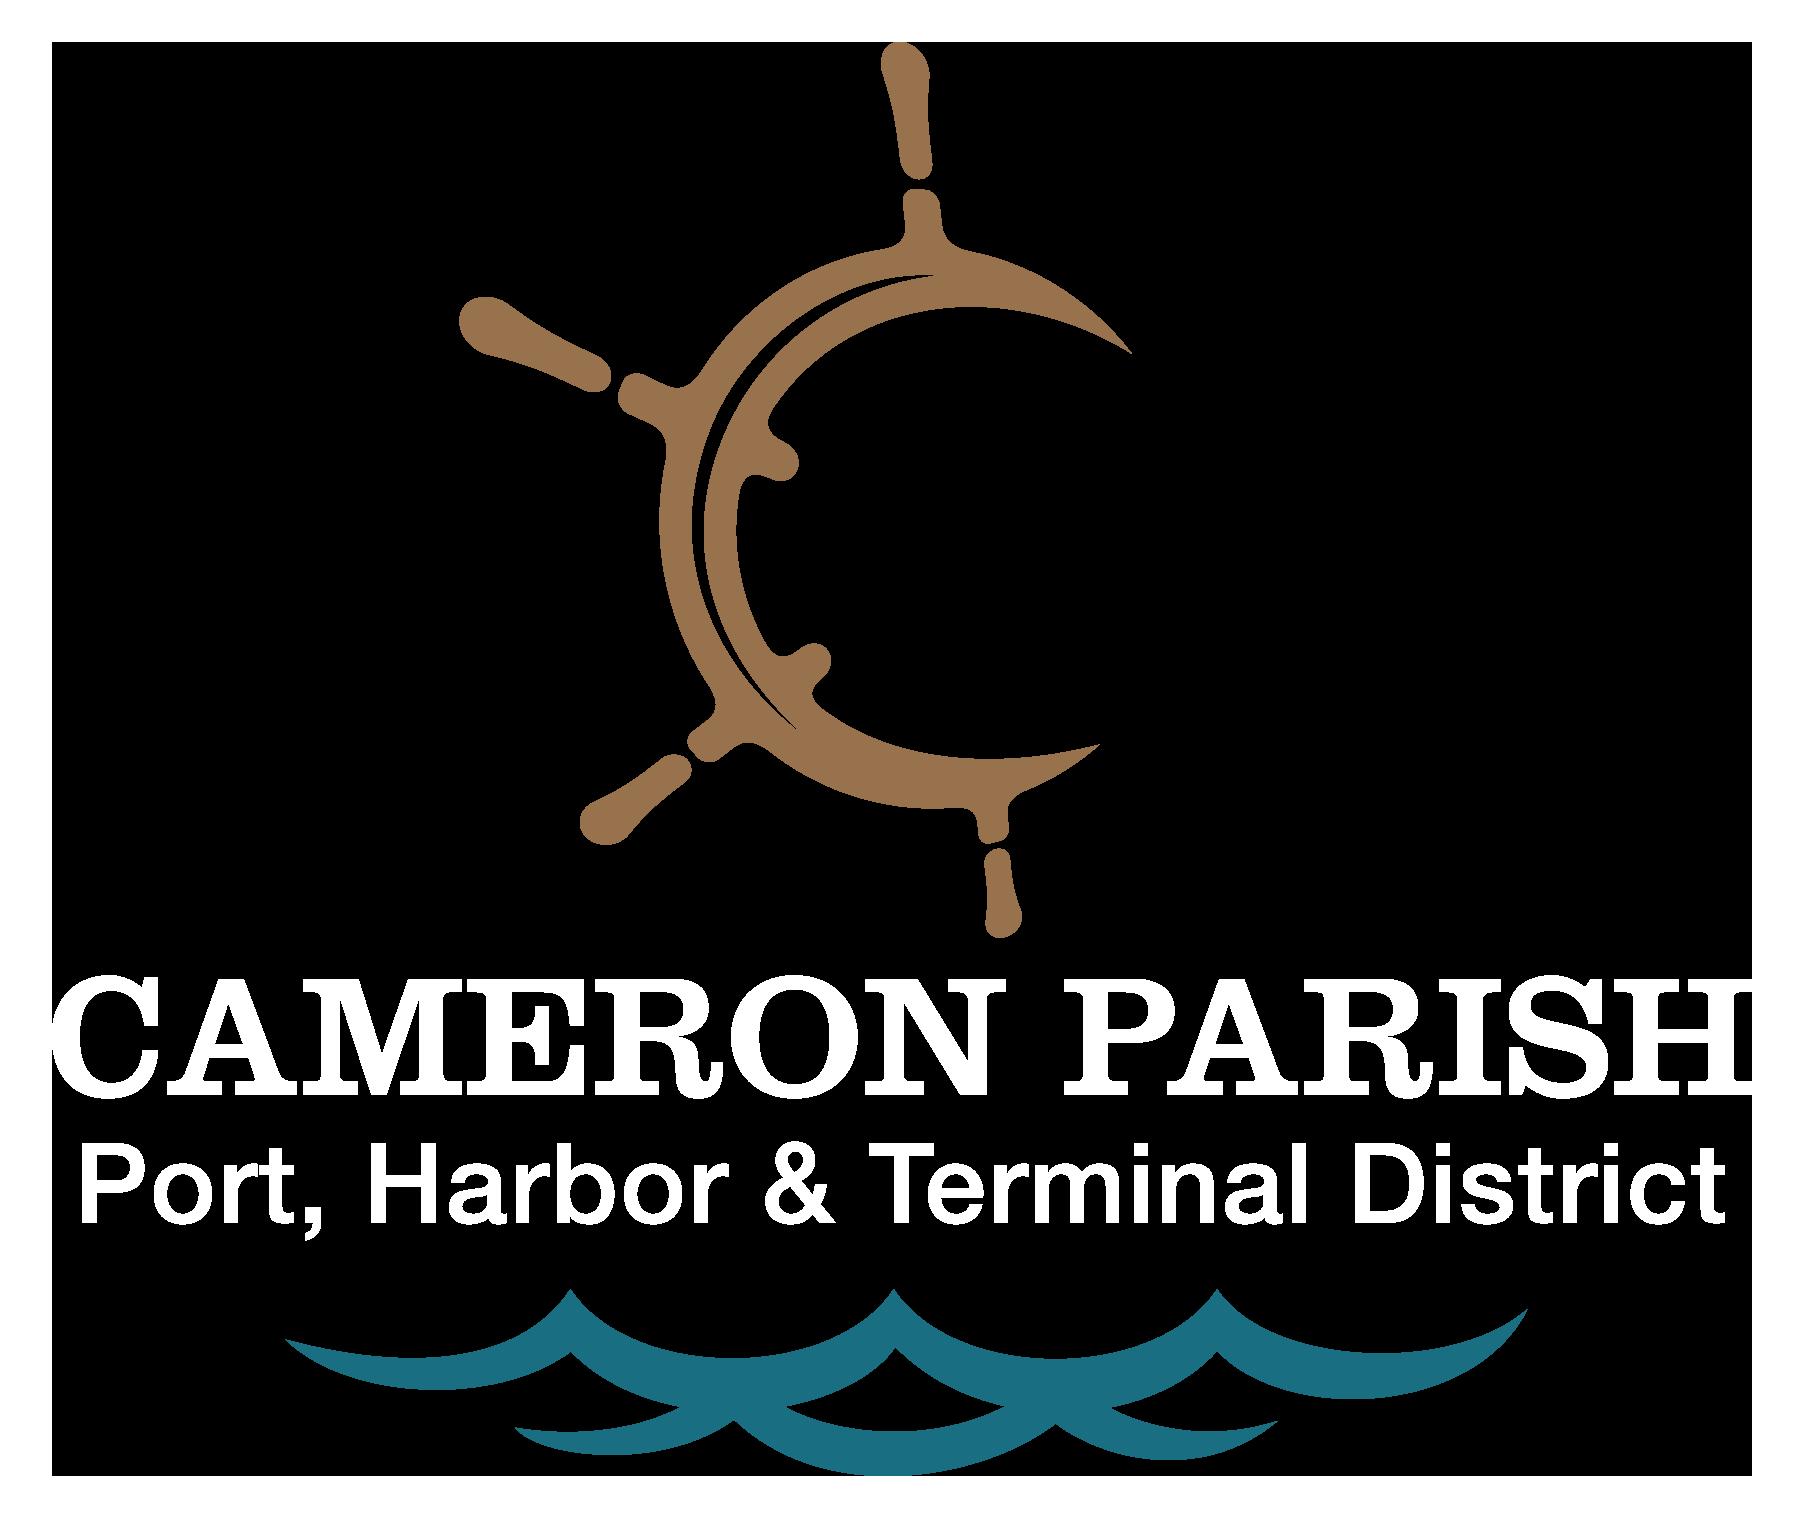 CAMERON PARISH PORT, HARBOR & TERMINAL DISTRICT.